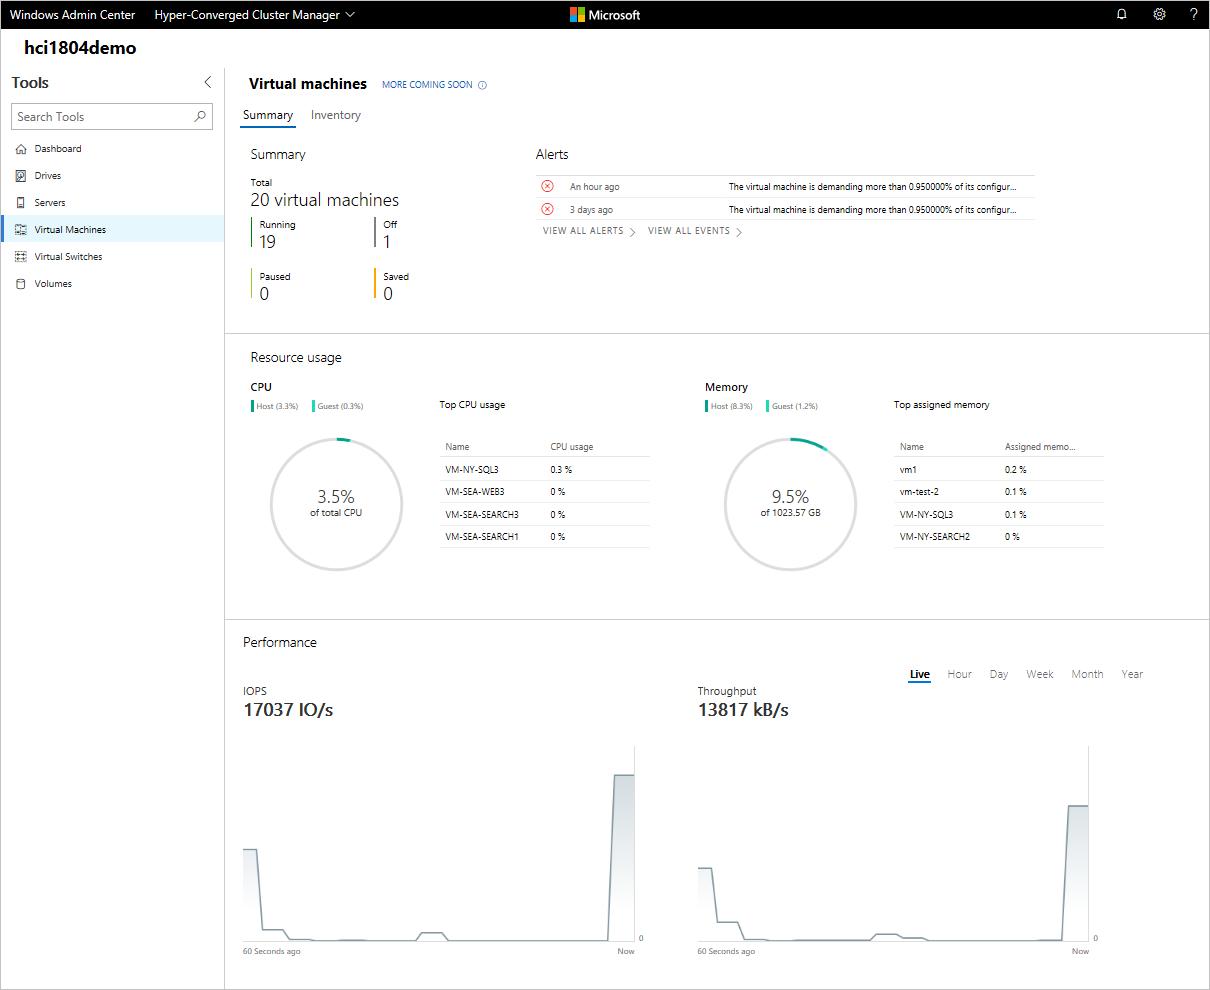 Administración de máquinas virtuales con Windows Admin Center ...